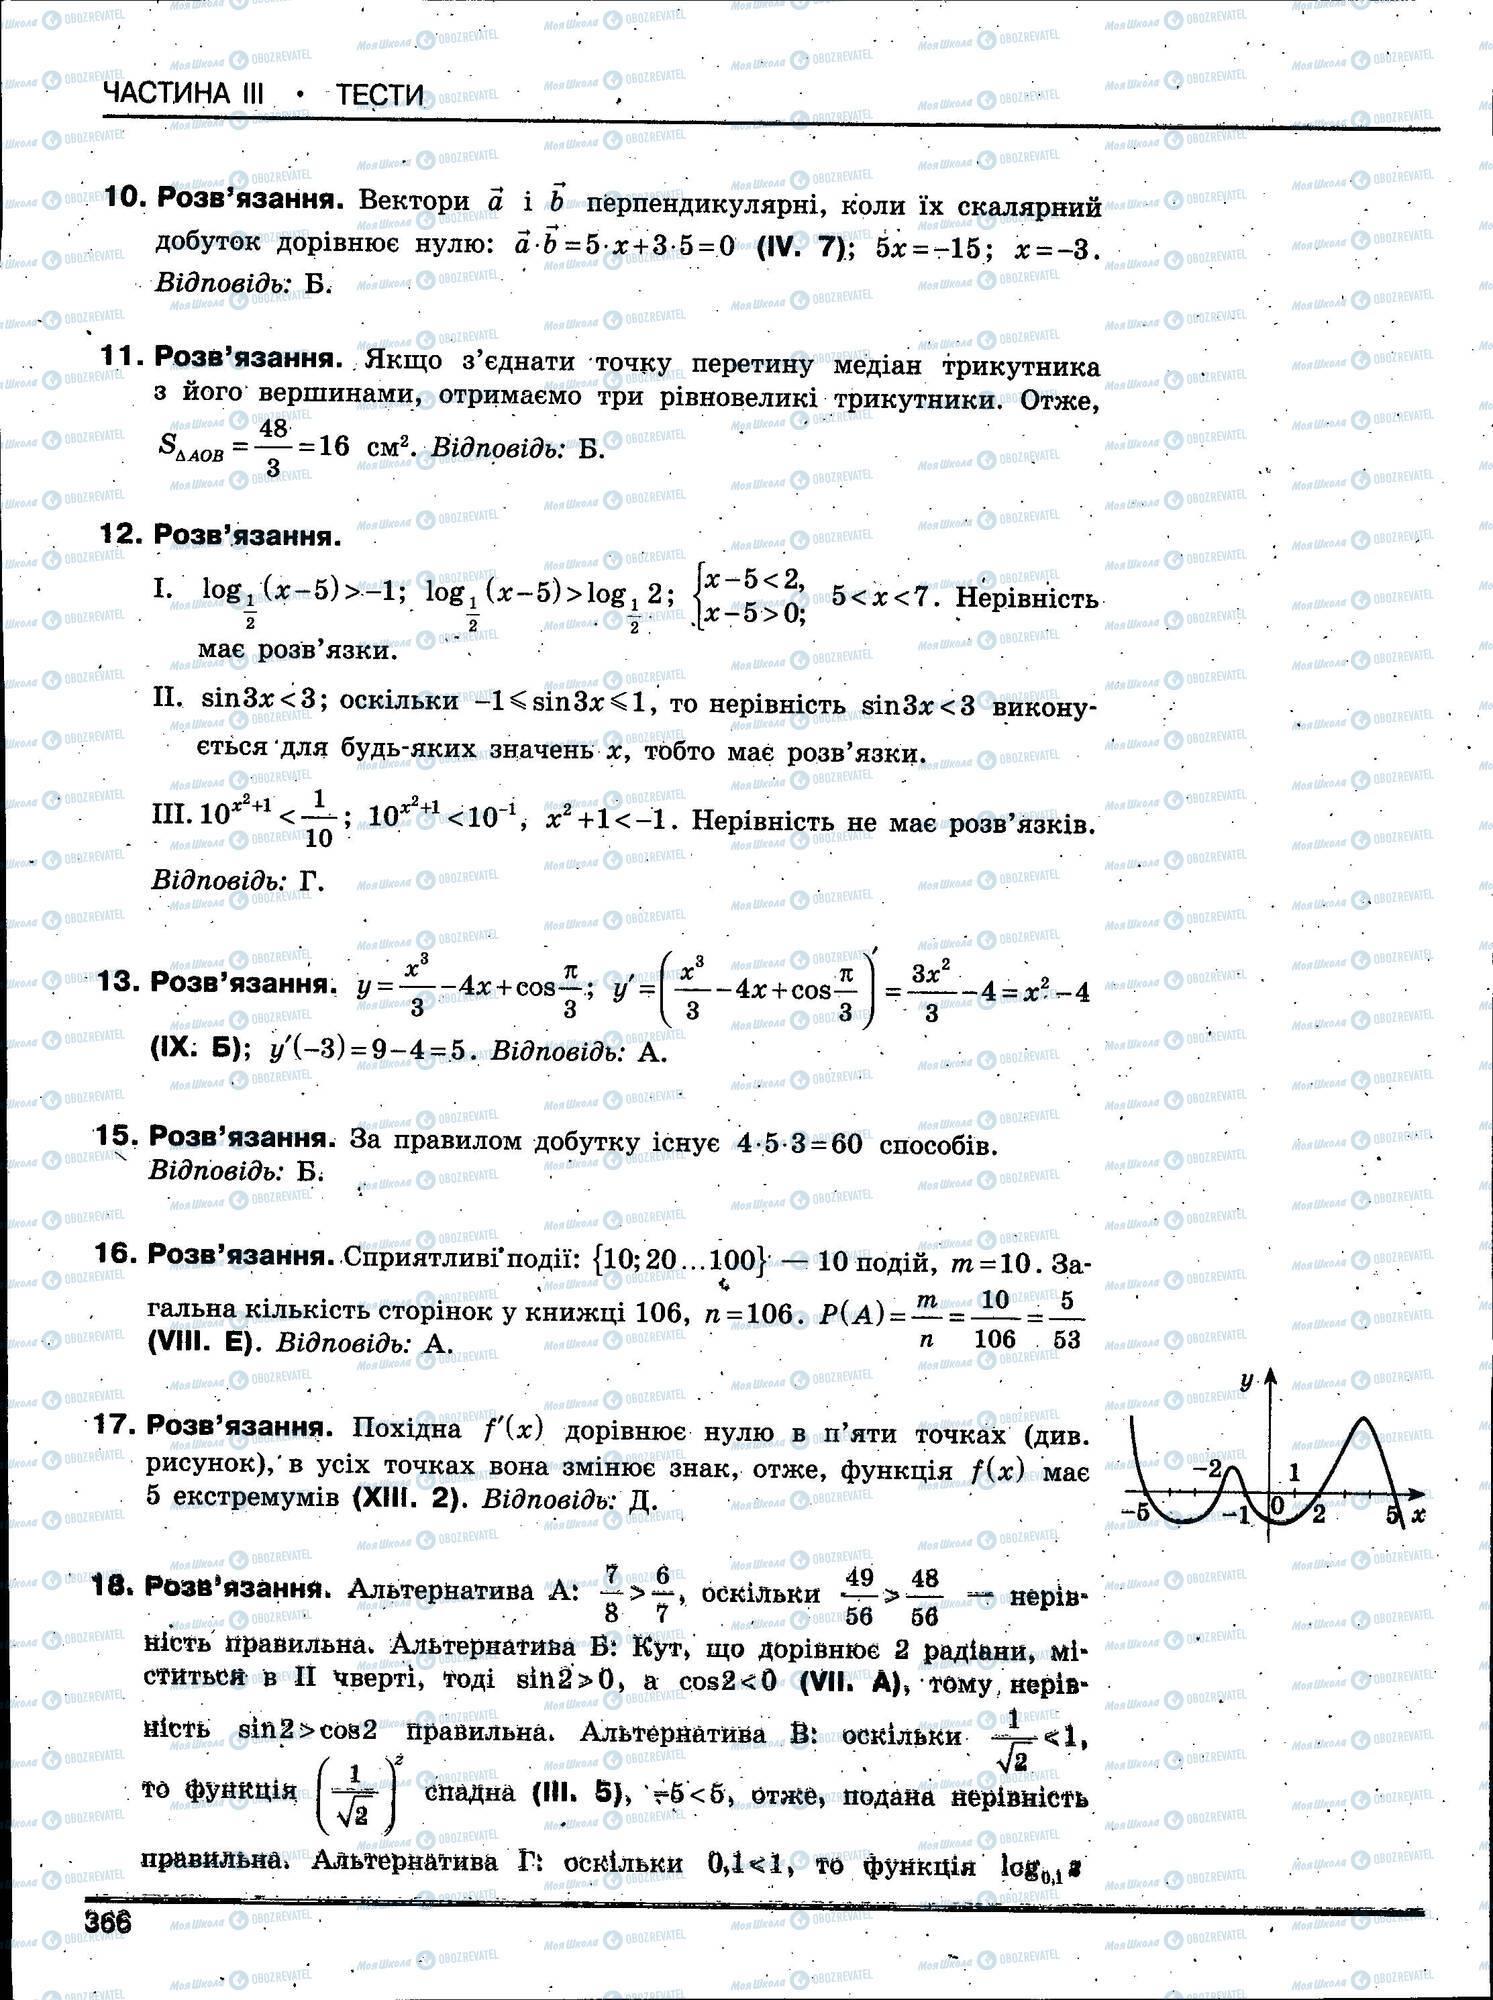 ЗНО Математика 11 класс страница 366